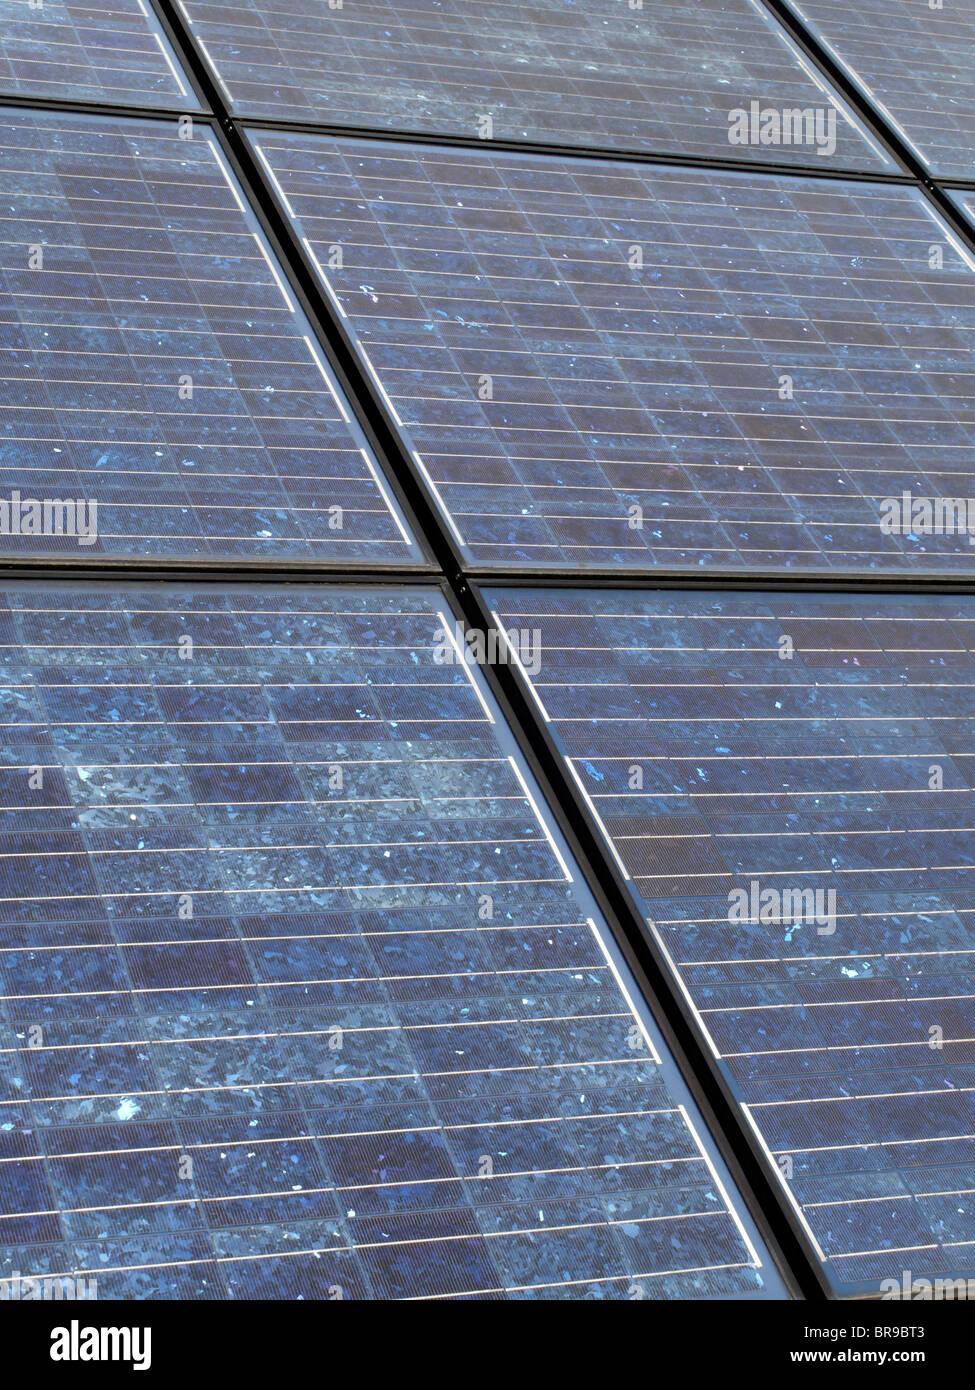 solarcells - solar power - Stock Image